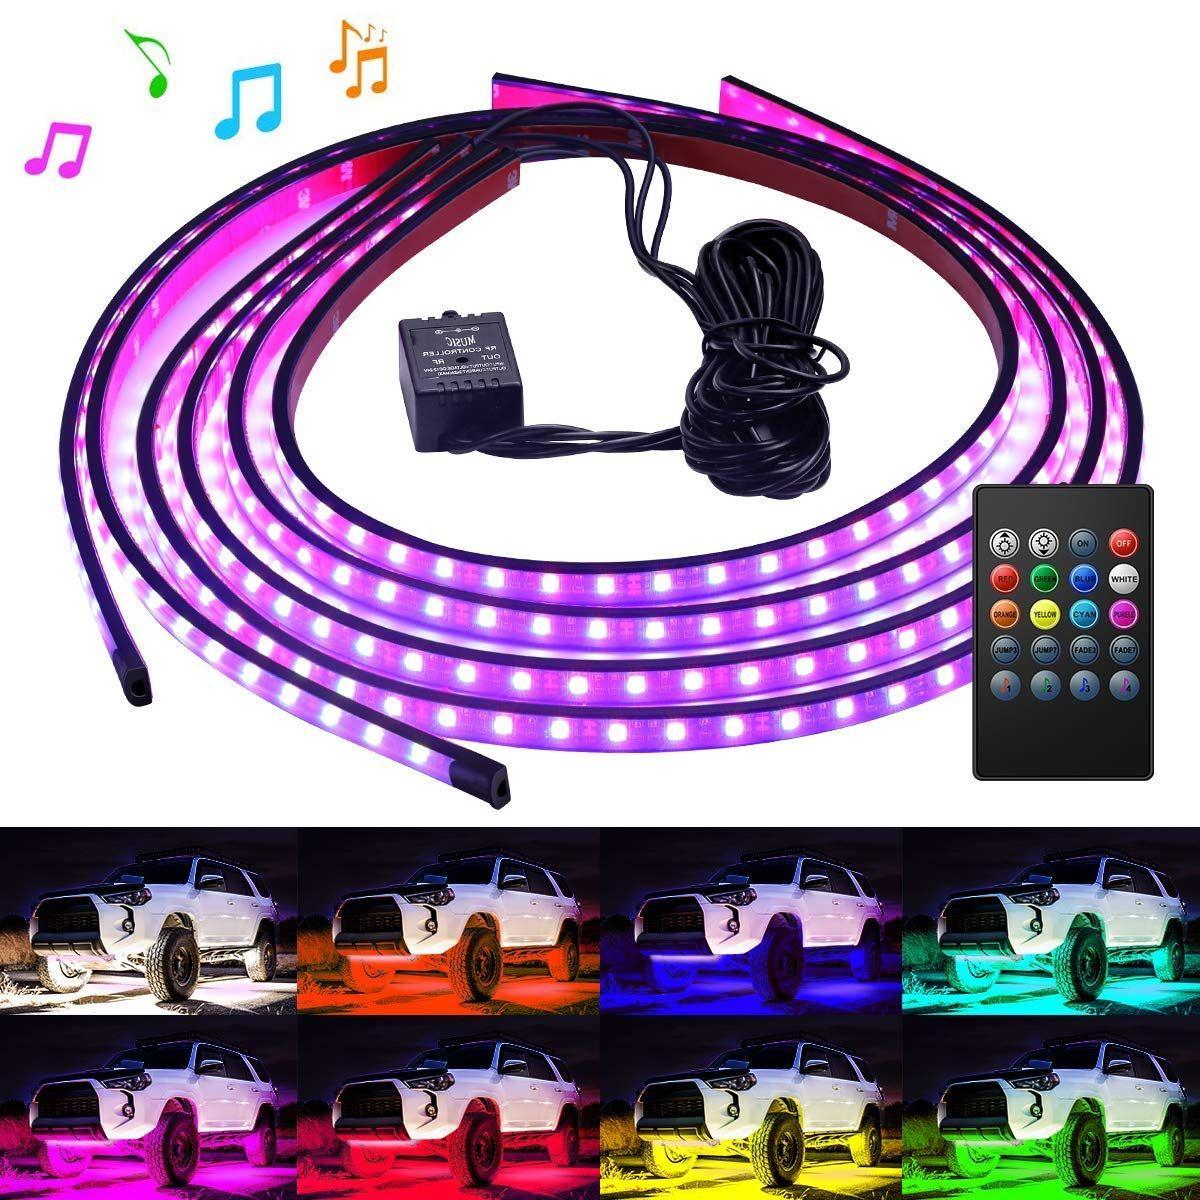 Govee Car Underglow Lights 4 Pcs Led Strip Car Lights 8